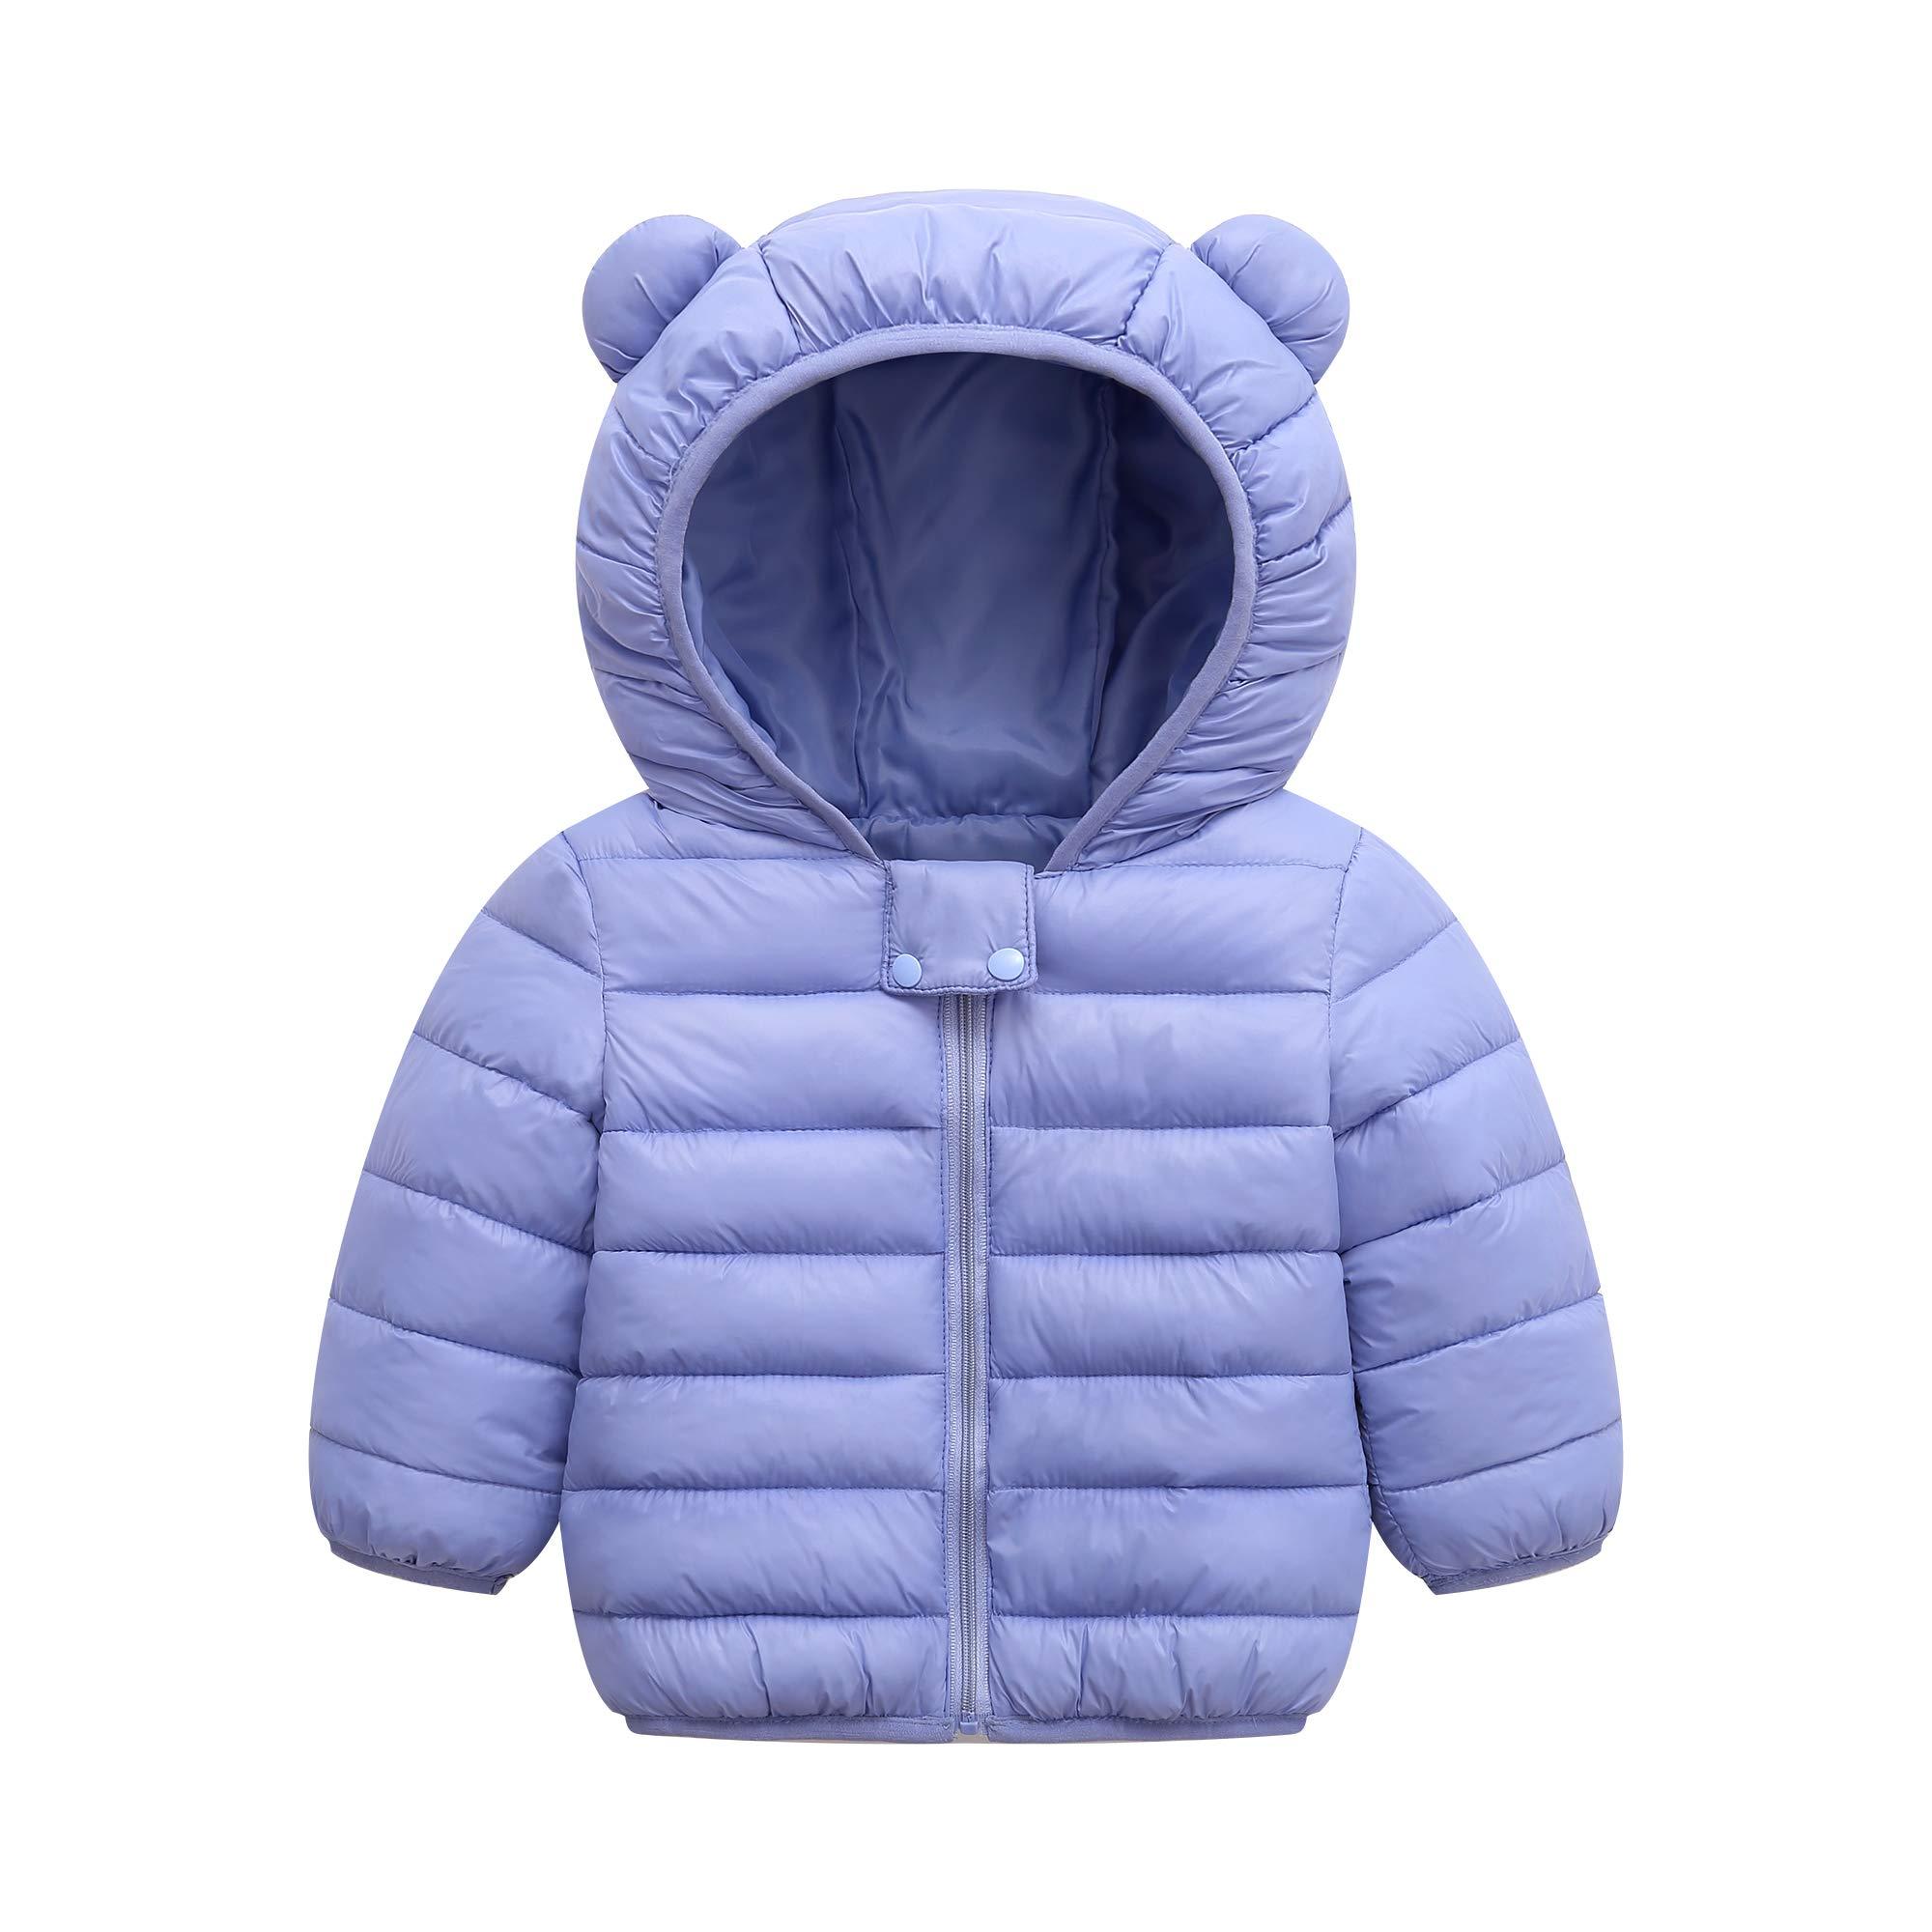 BSC007 Baby Boys Girls Winter Coats Hoods Light Puffer Down Jacket Outwear by BSC007